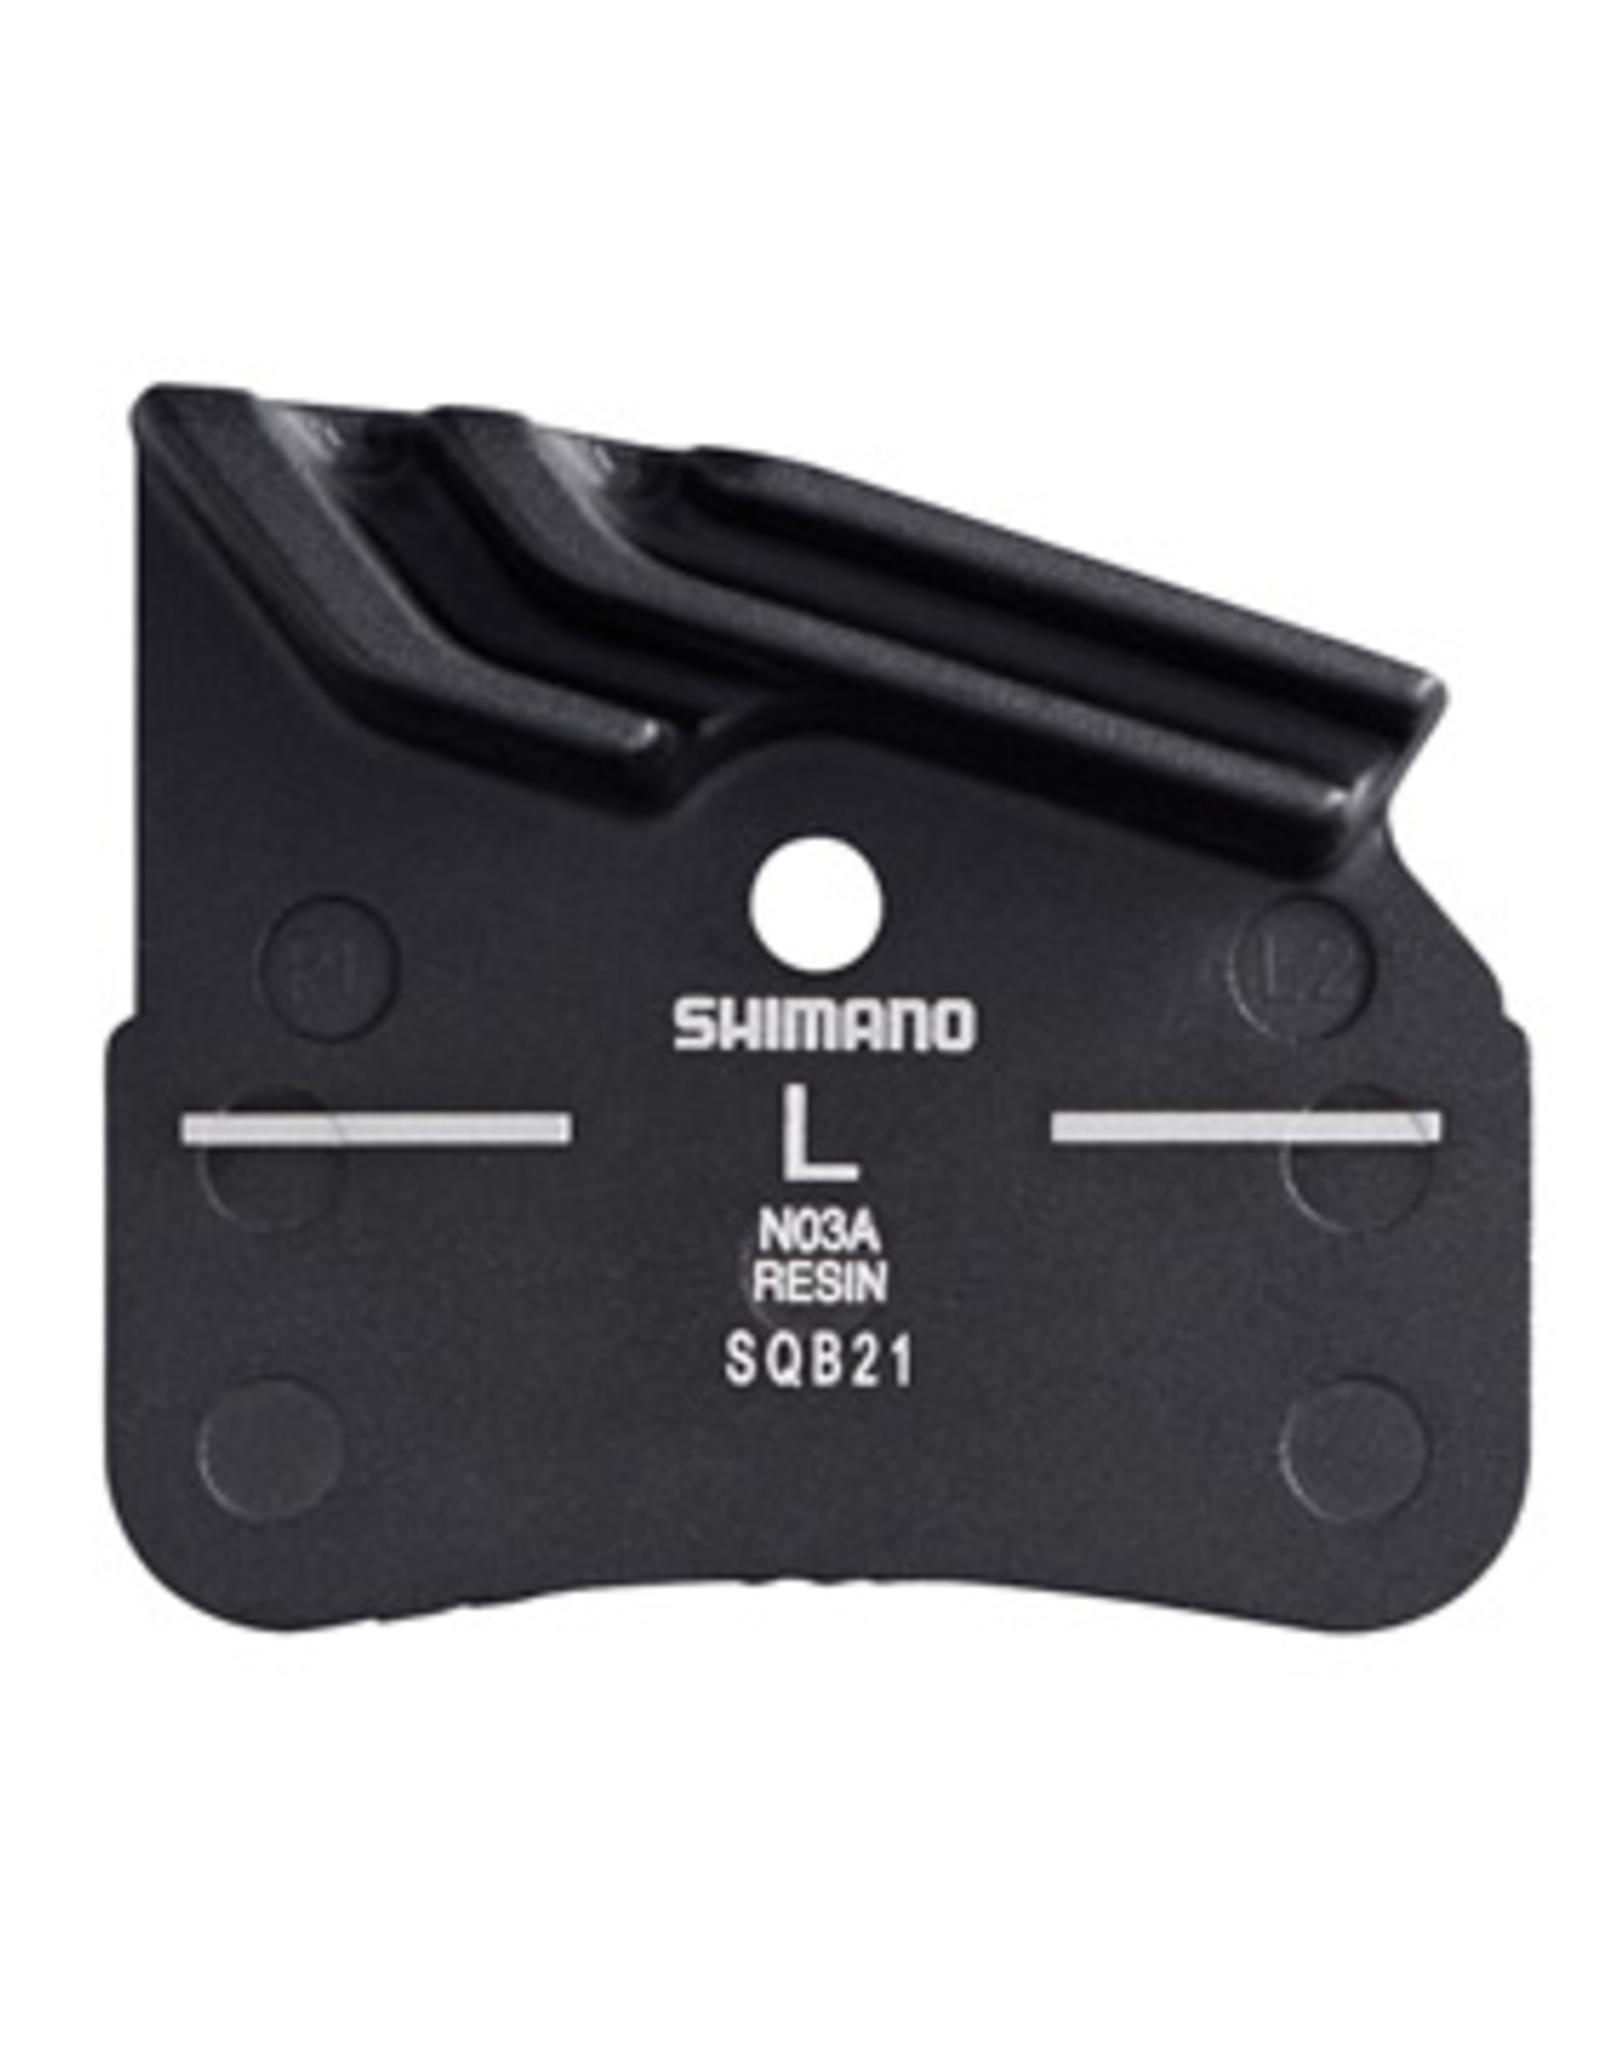 Shimano N03a Disc brake pads